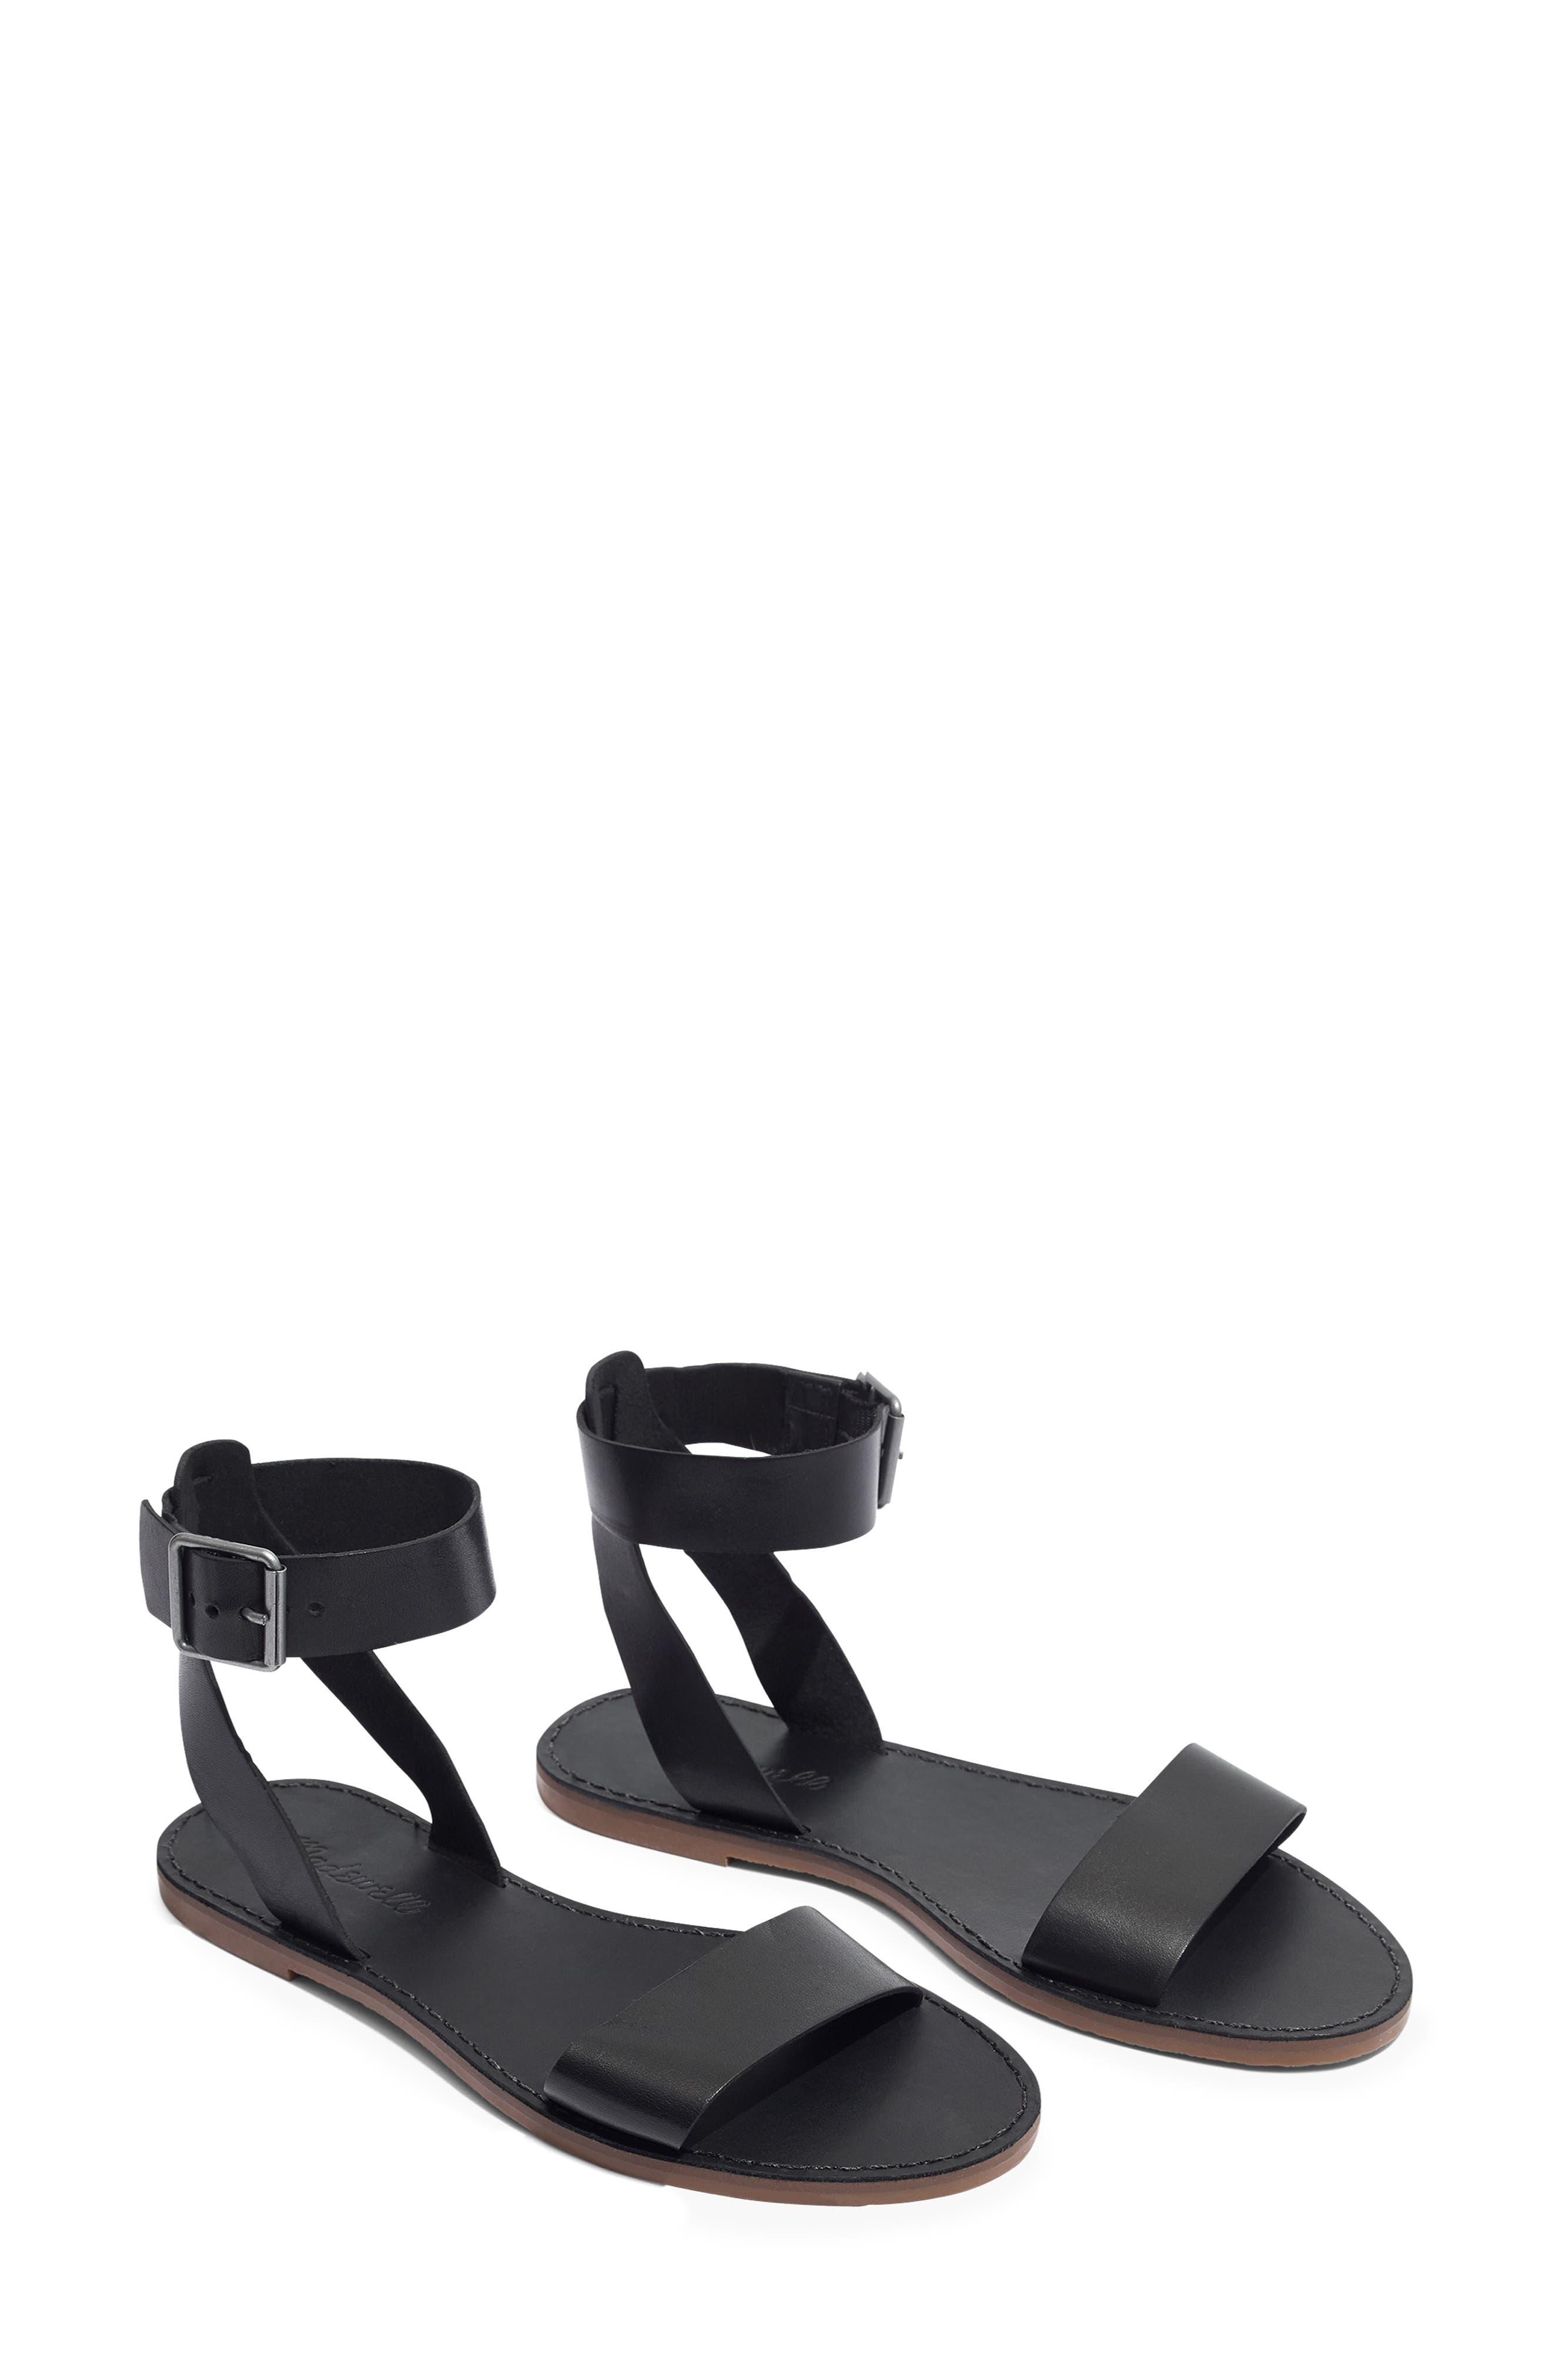 MADEWELL,                             The Boardwalk Ankle Strap Sandal,                             Alternate thumbnail 8, color,                             TRUE BLACK LEATHER